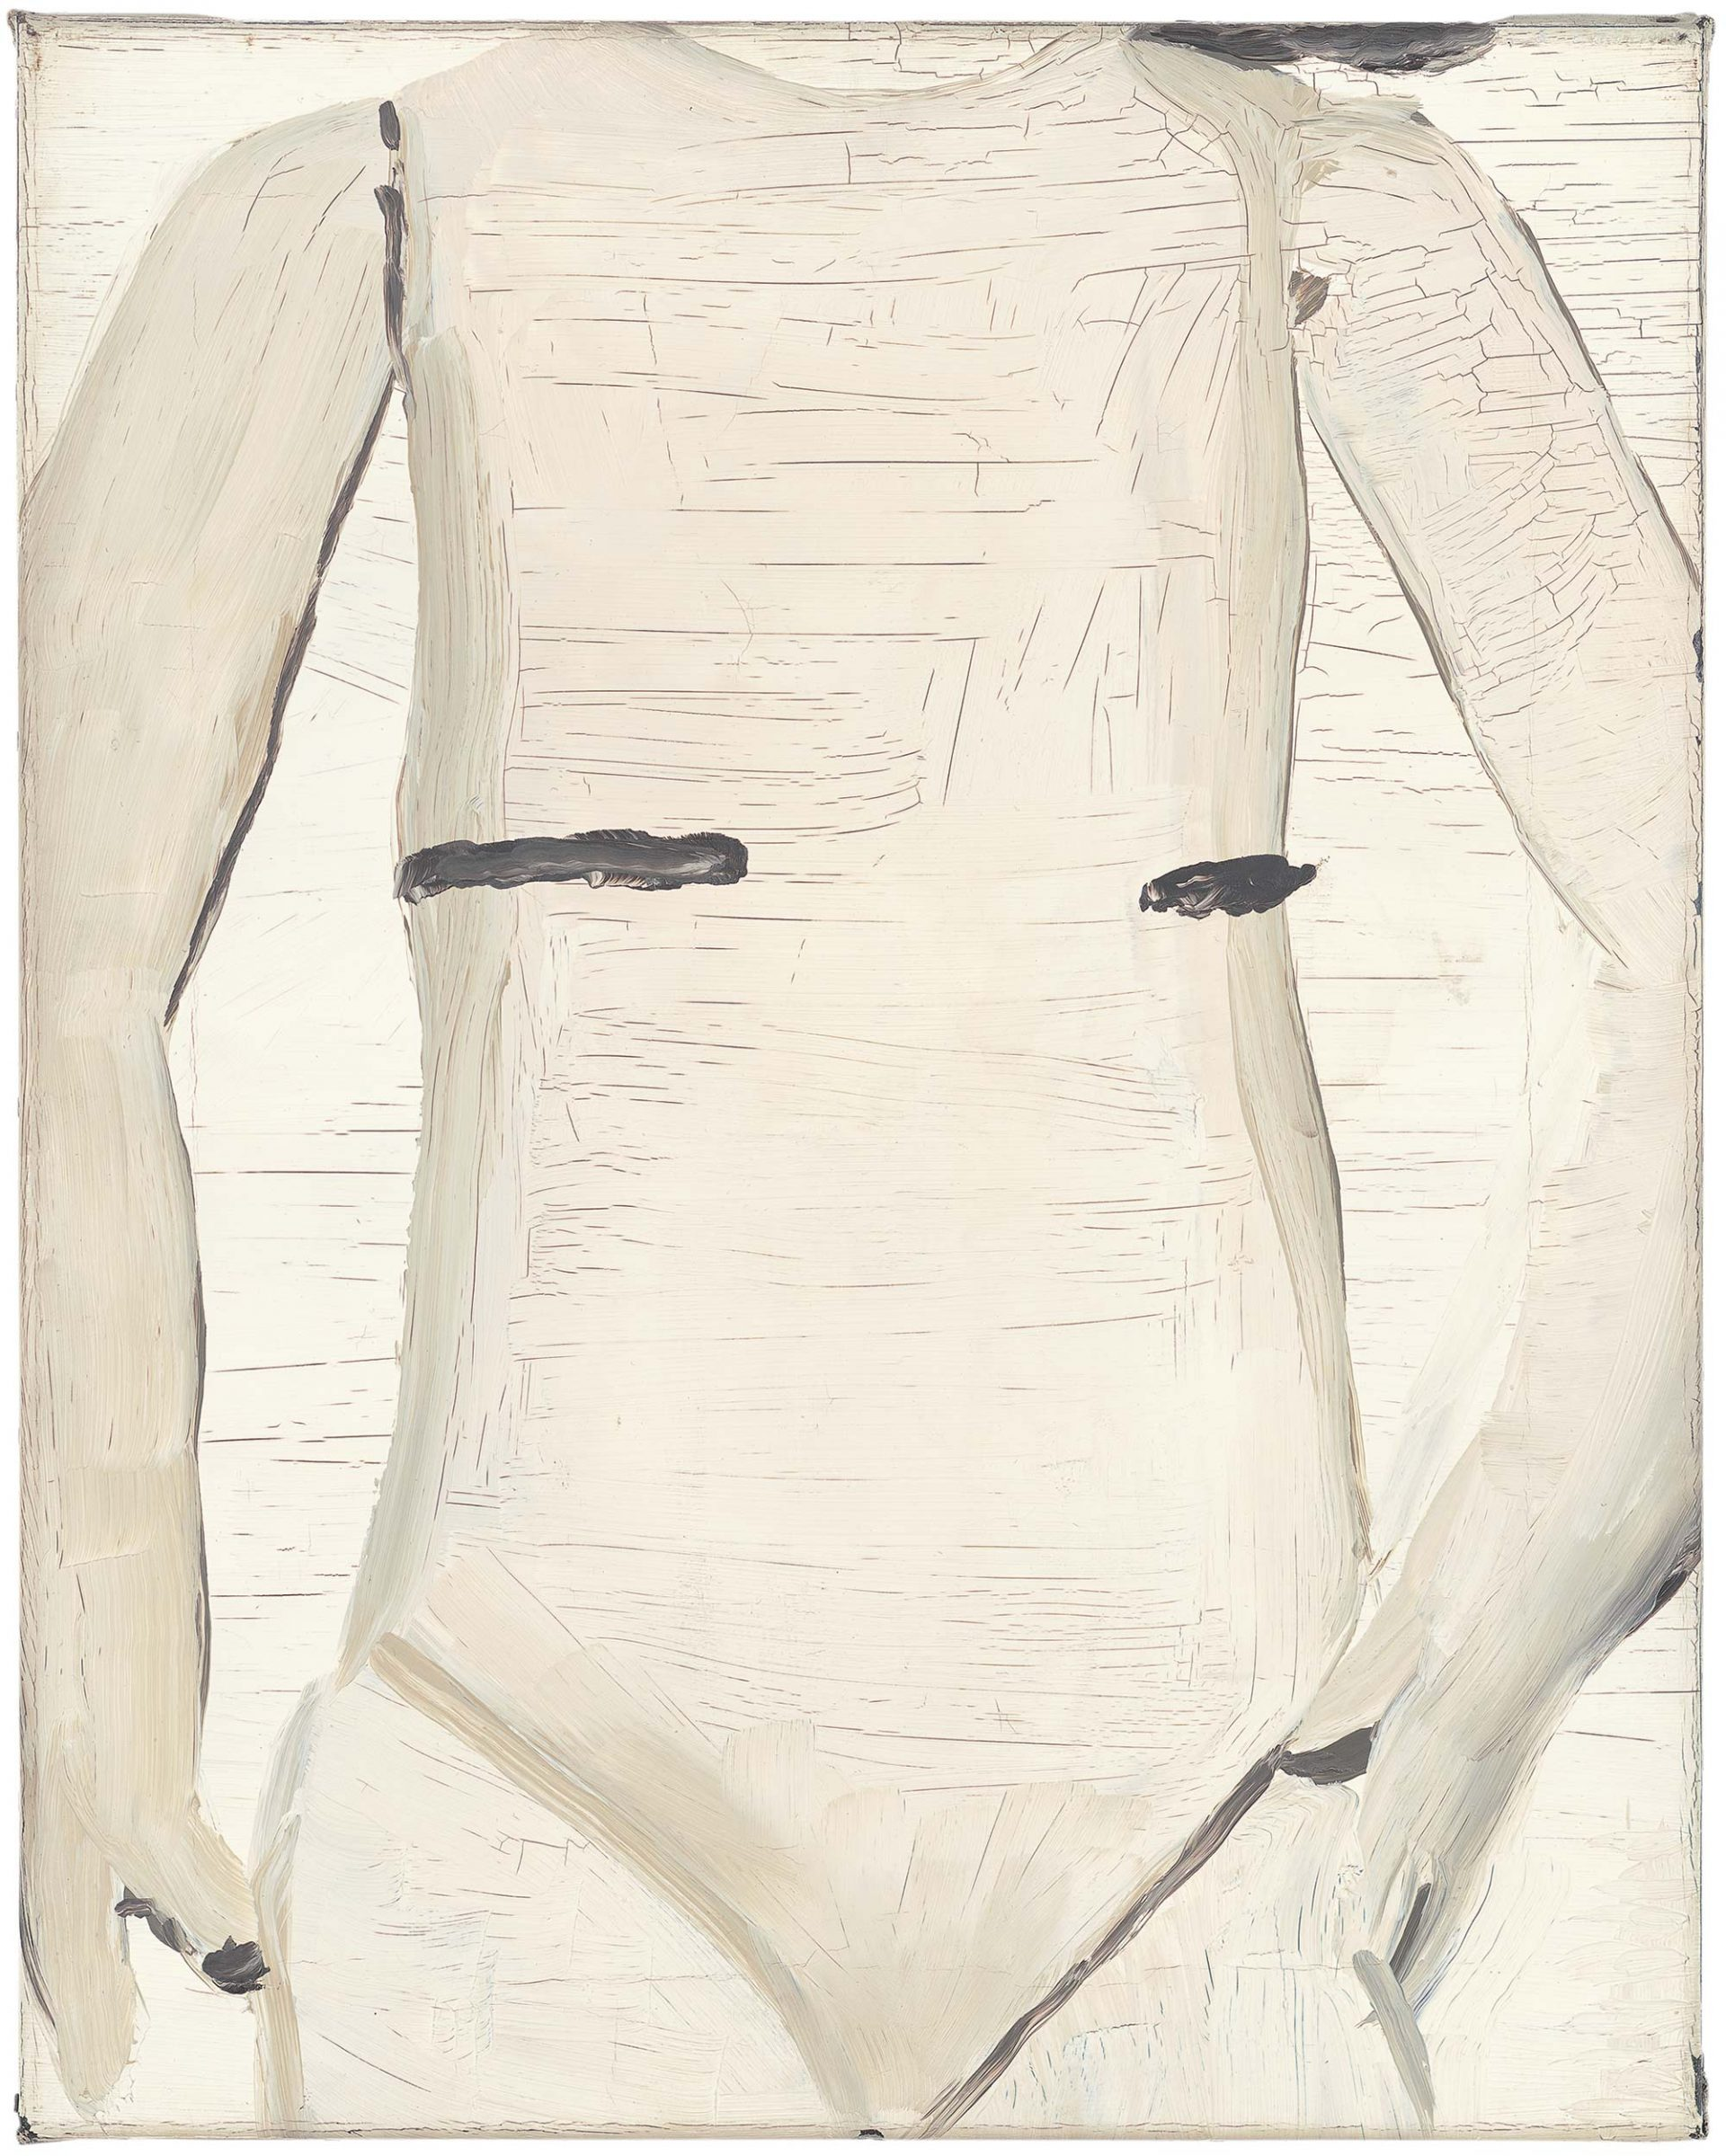 Body, 1990 - (c)Ben Blackwell, courtesy David Zwirner, New York London